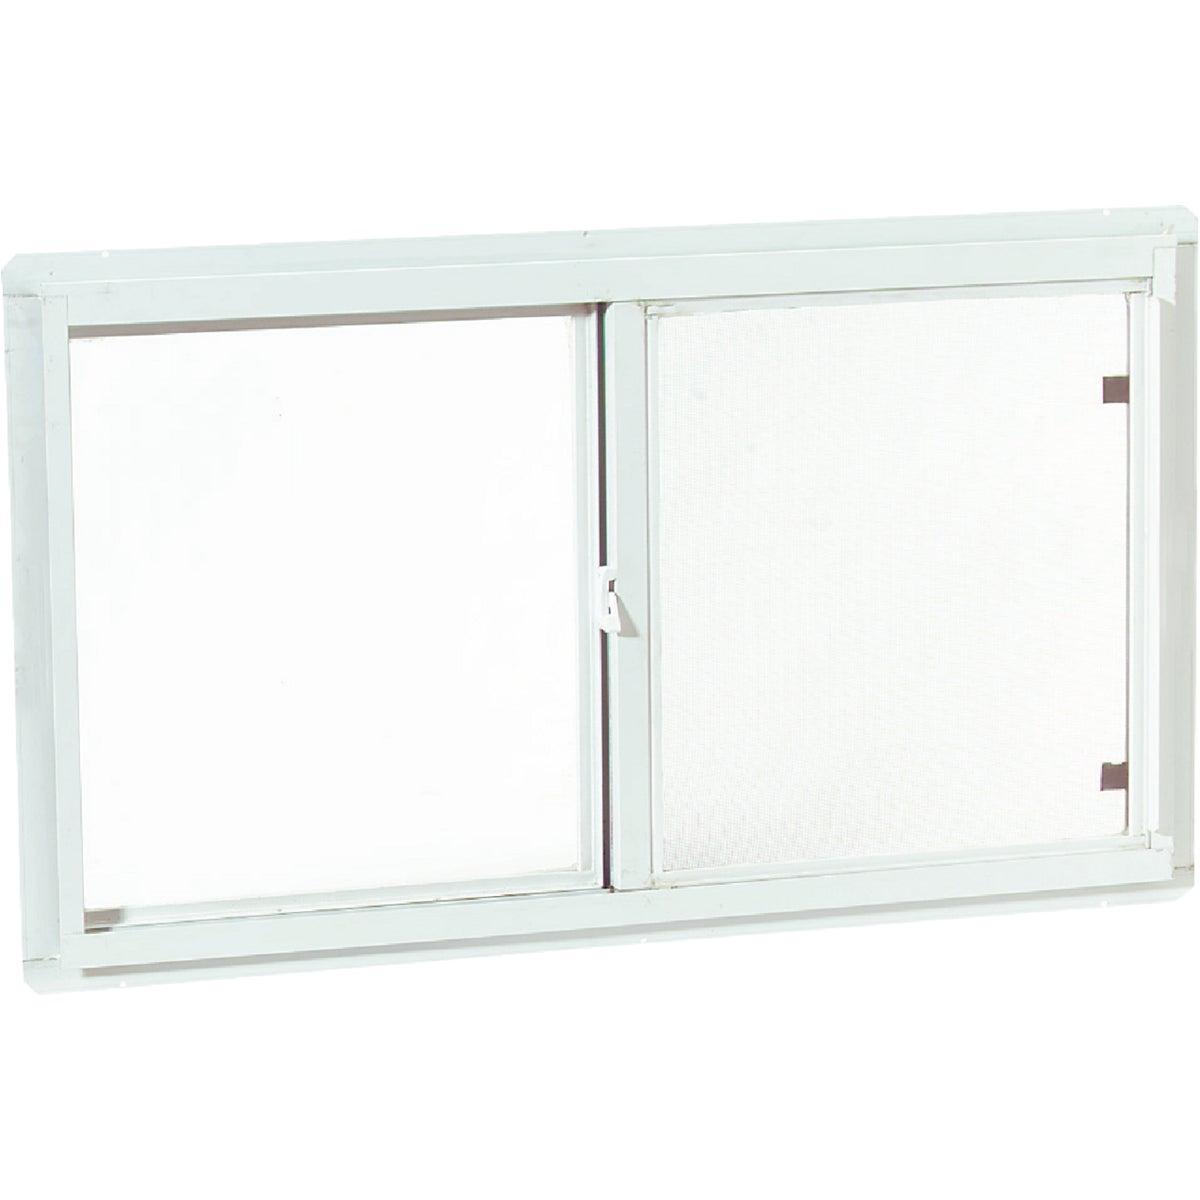 51W 46X22 SLIDING WINDOW - F0436773 by Croft Llc